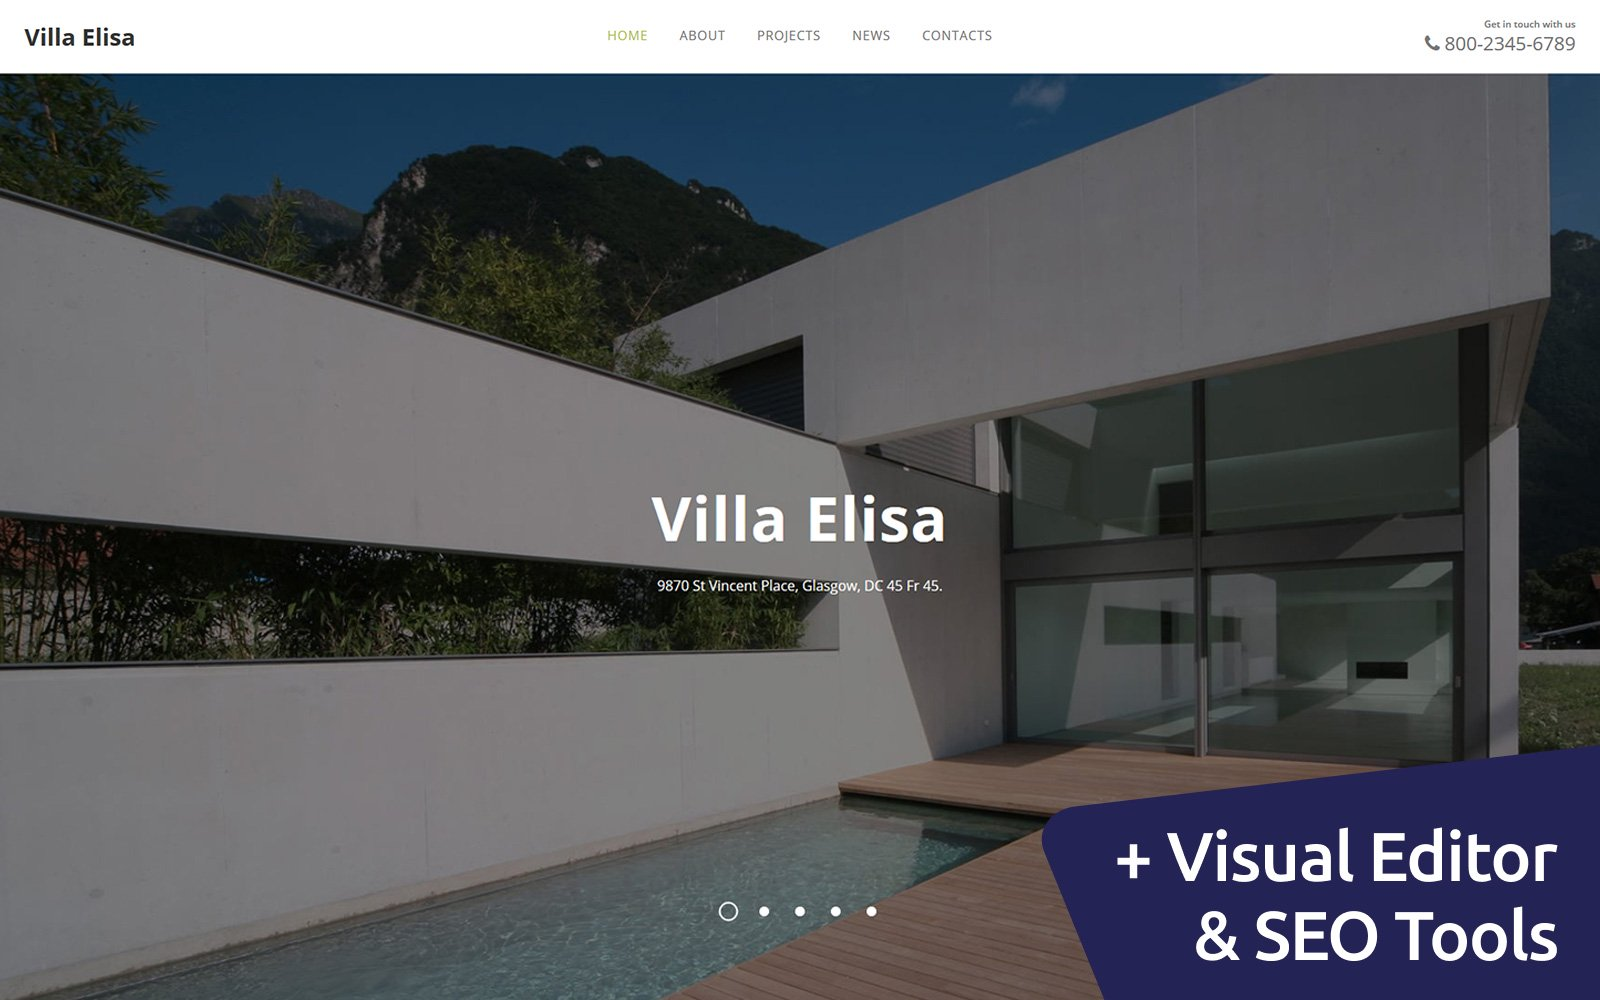 """Villa Elisa - Real Estate"" modèle Moto CMS 3 adaptatif #111048"